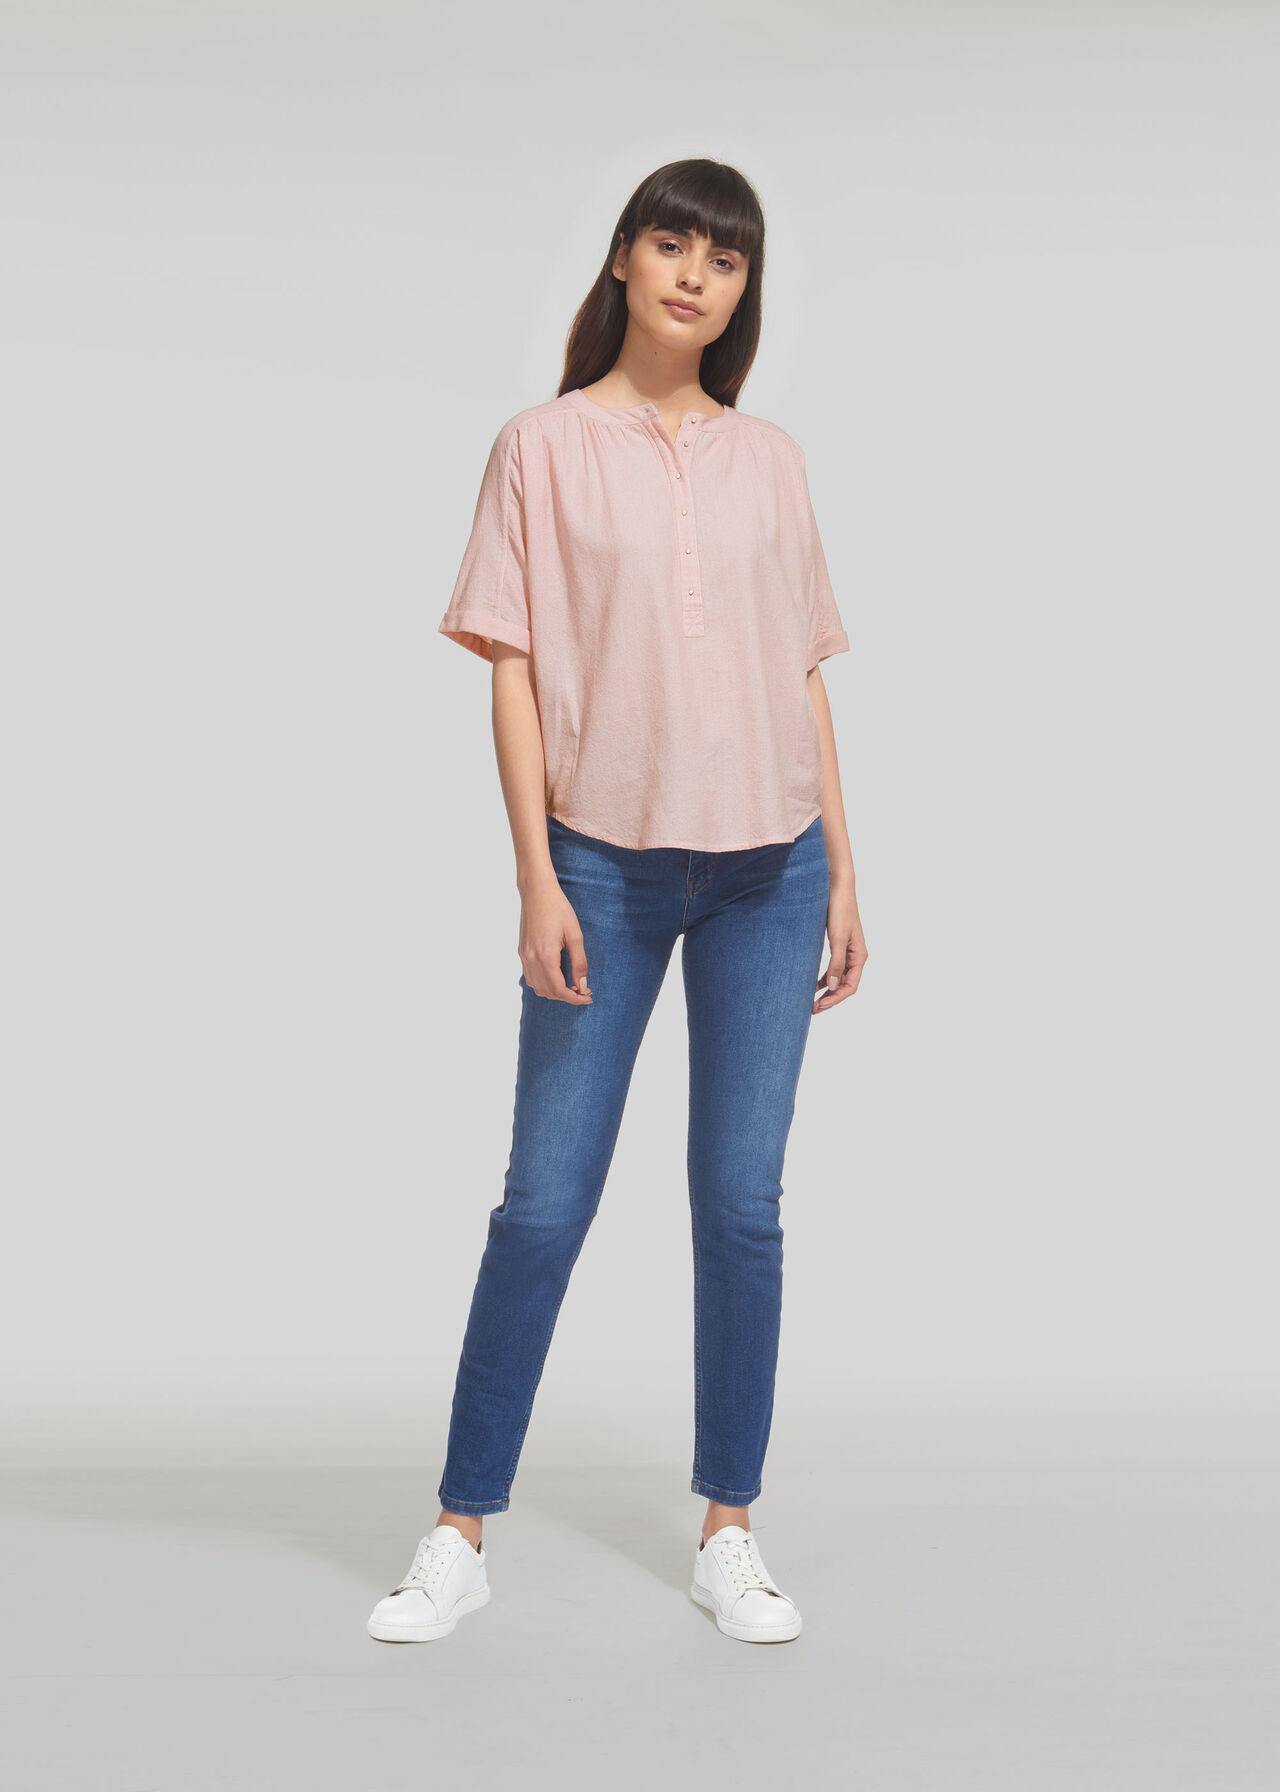 Paula Stripe Placket Blouse Pink/Multi